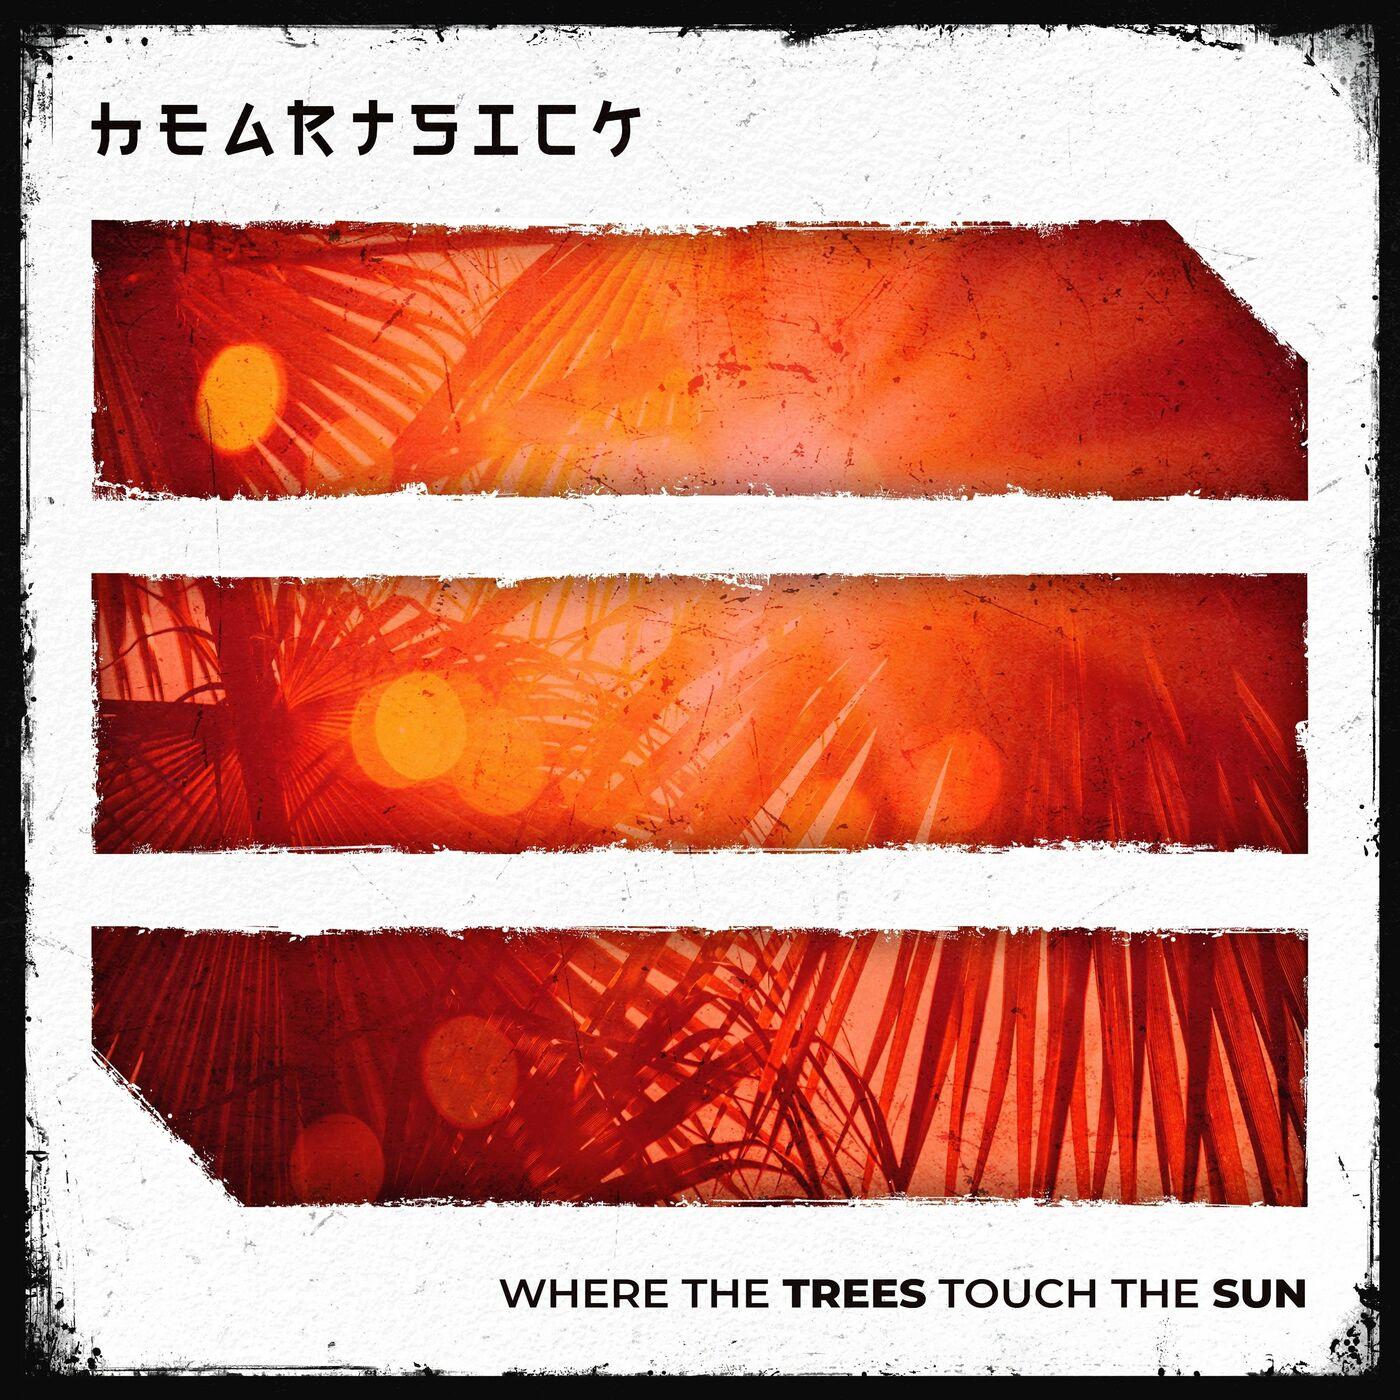 Heartsick - Where the trees touch the sun [single] (2021)